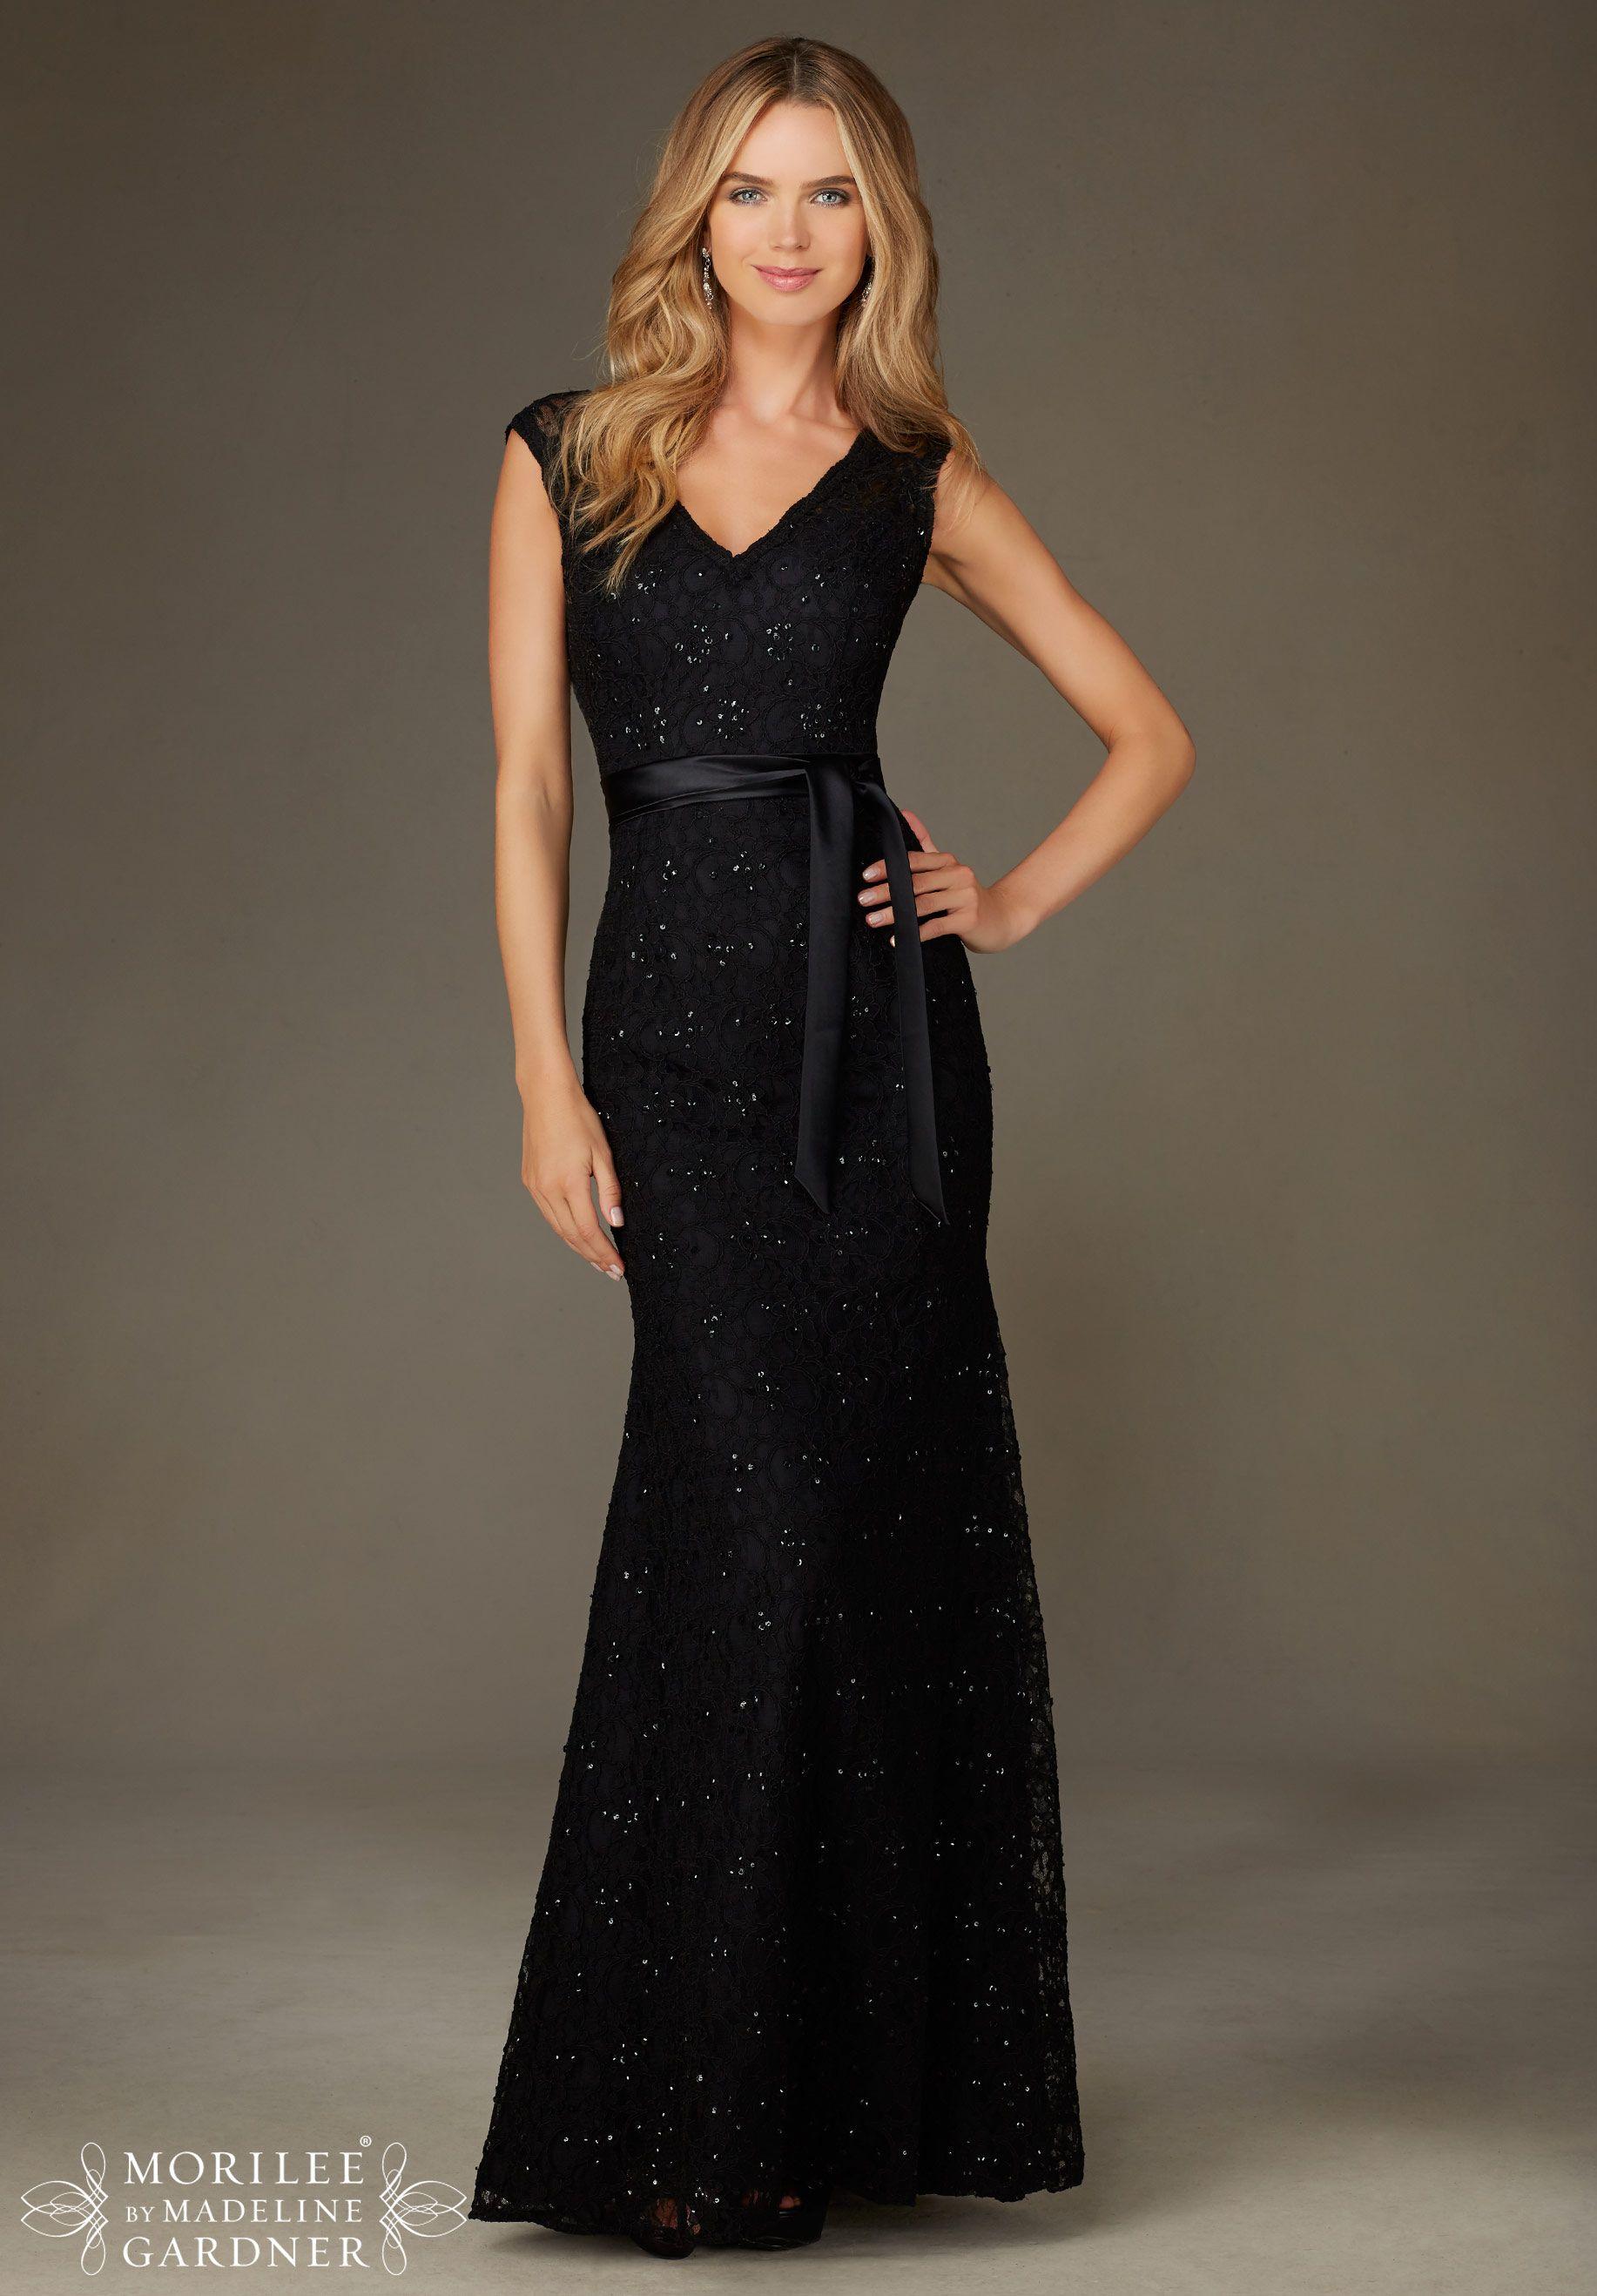 Mori Lee Bridesmaids Dress 127 BEADED LACE Available in all Mori Lee Solid  Lace Bridesmaids colors. 1c22c5c49761